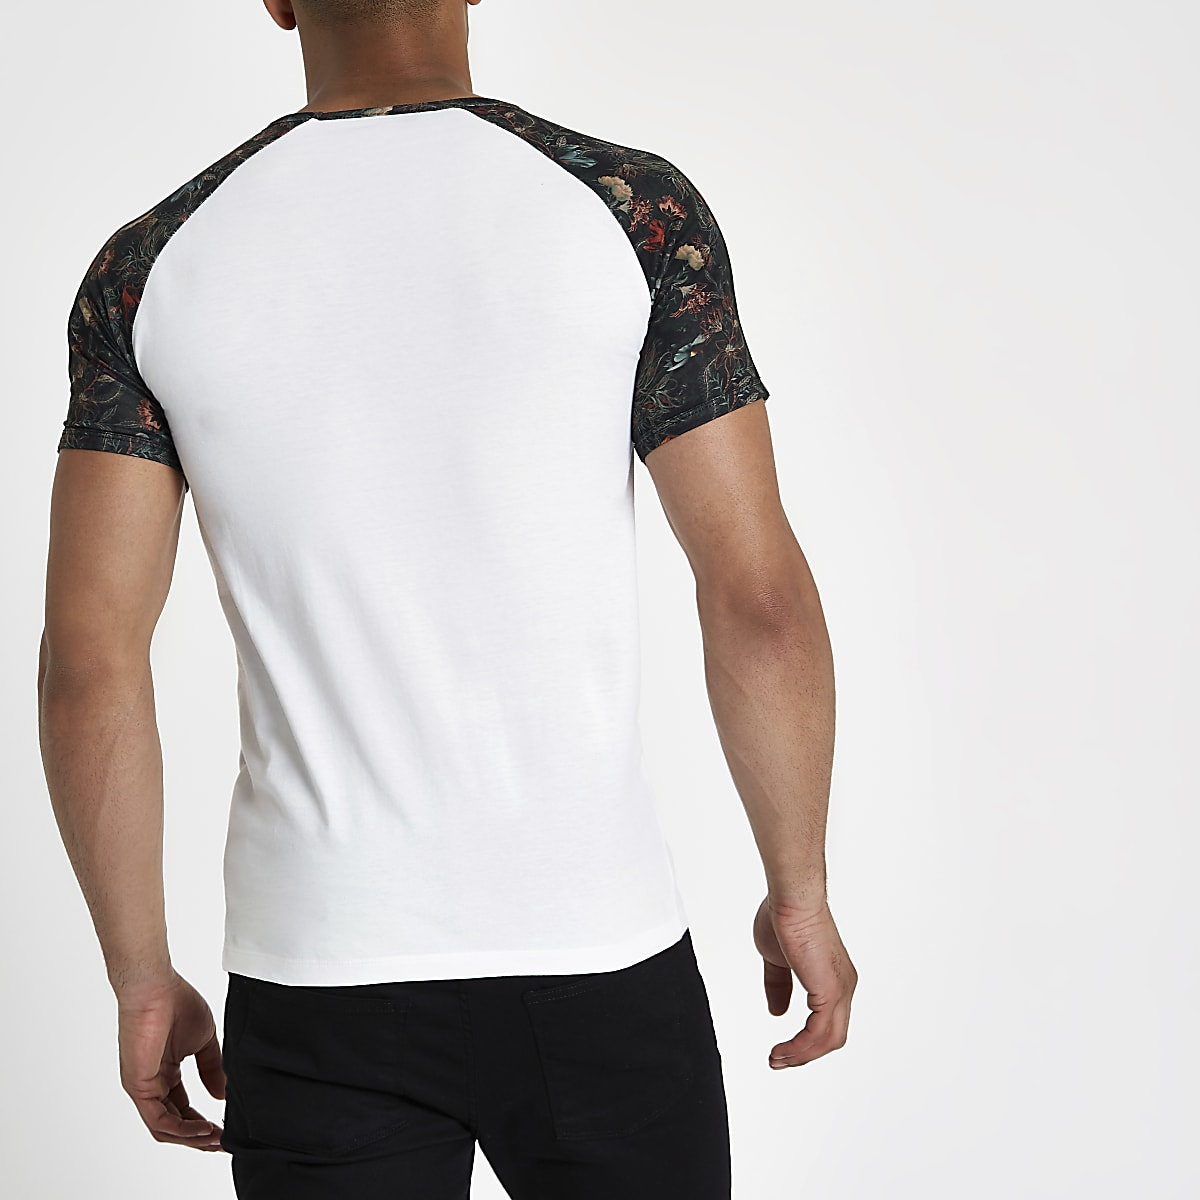 b3c88394 White 'paradise' muscle fit raglan T-shirt - T-shirts - T-Shirts ...